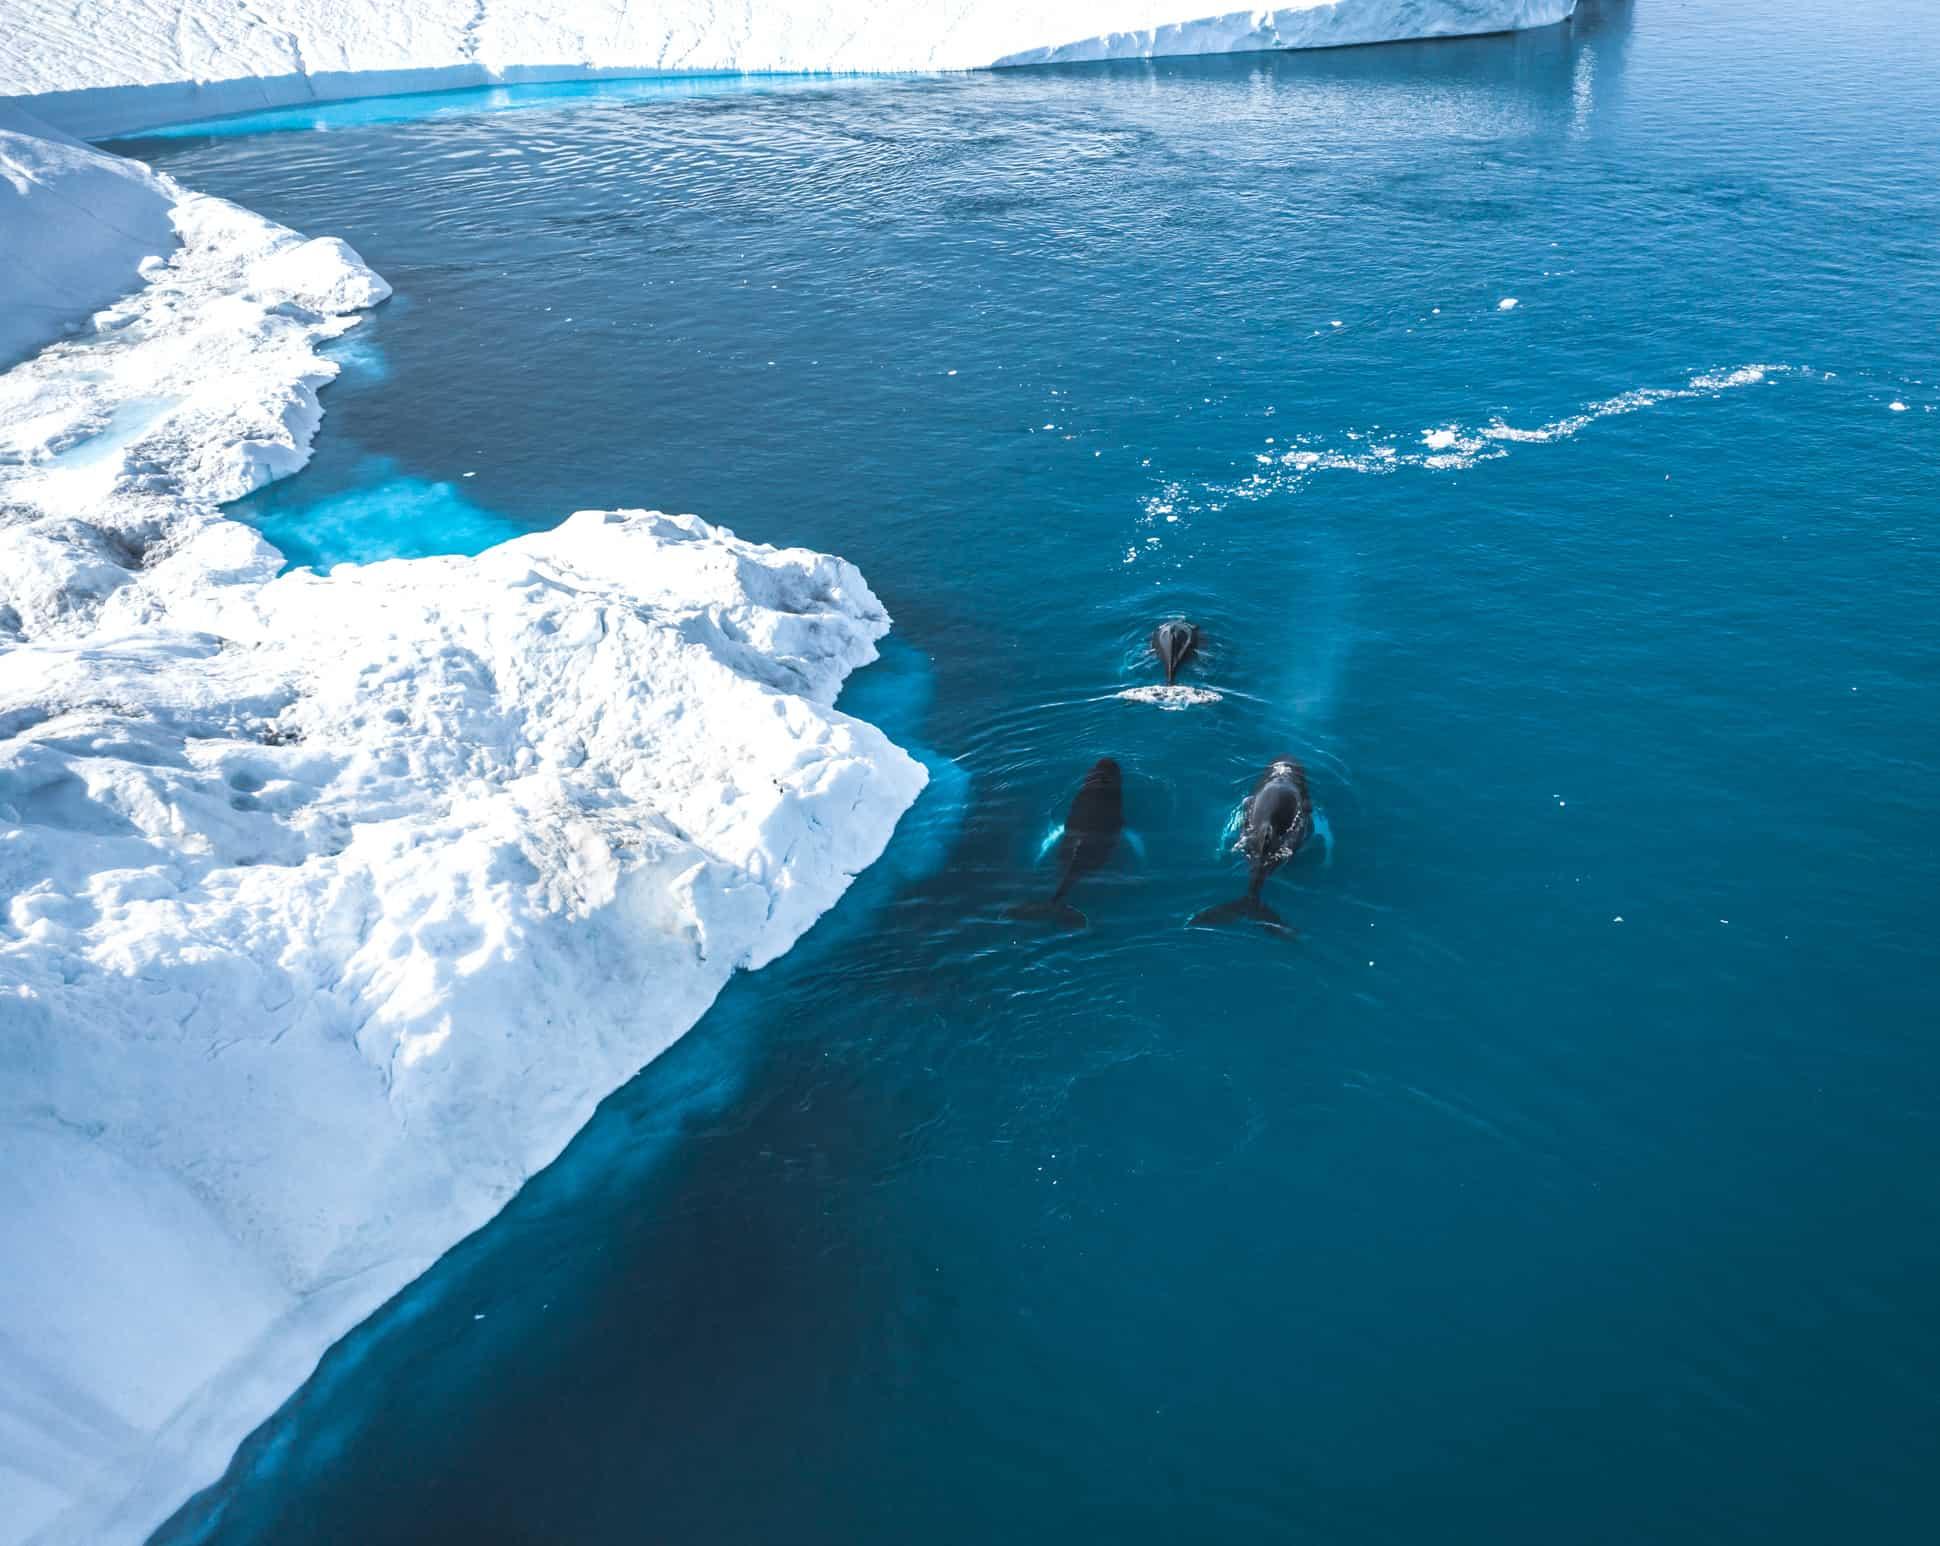 Humpback whales near Ilulissat among the icebergs